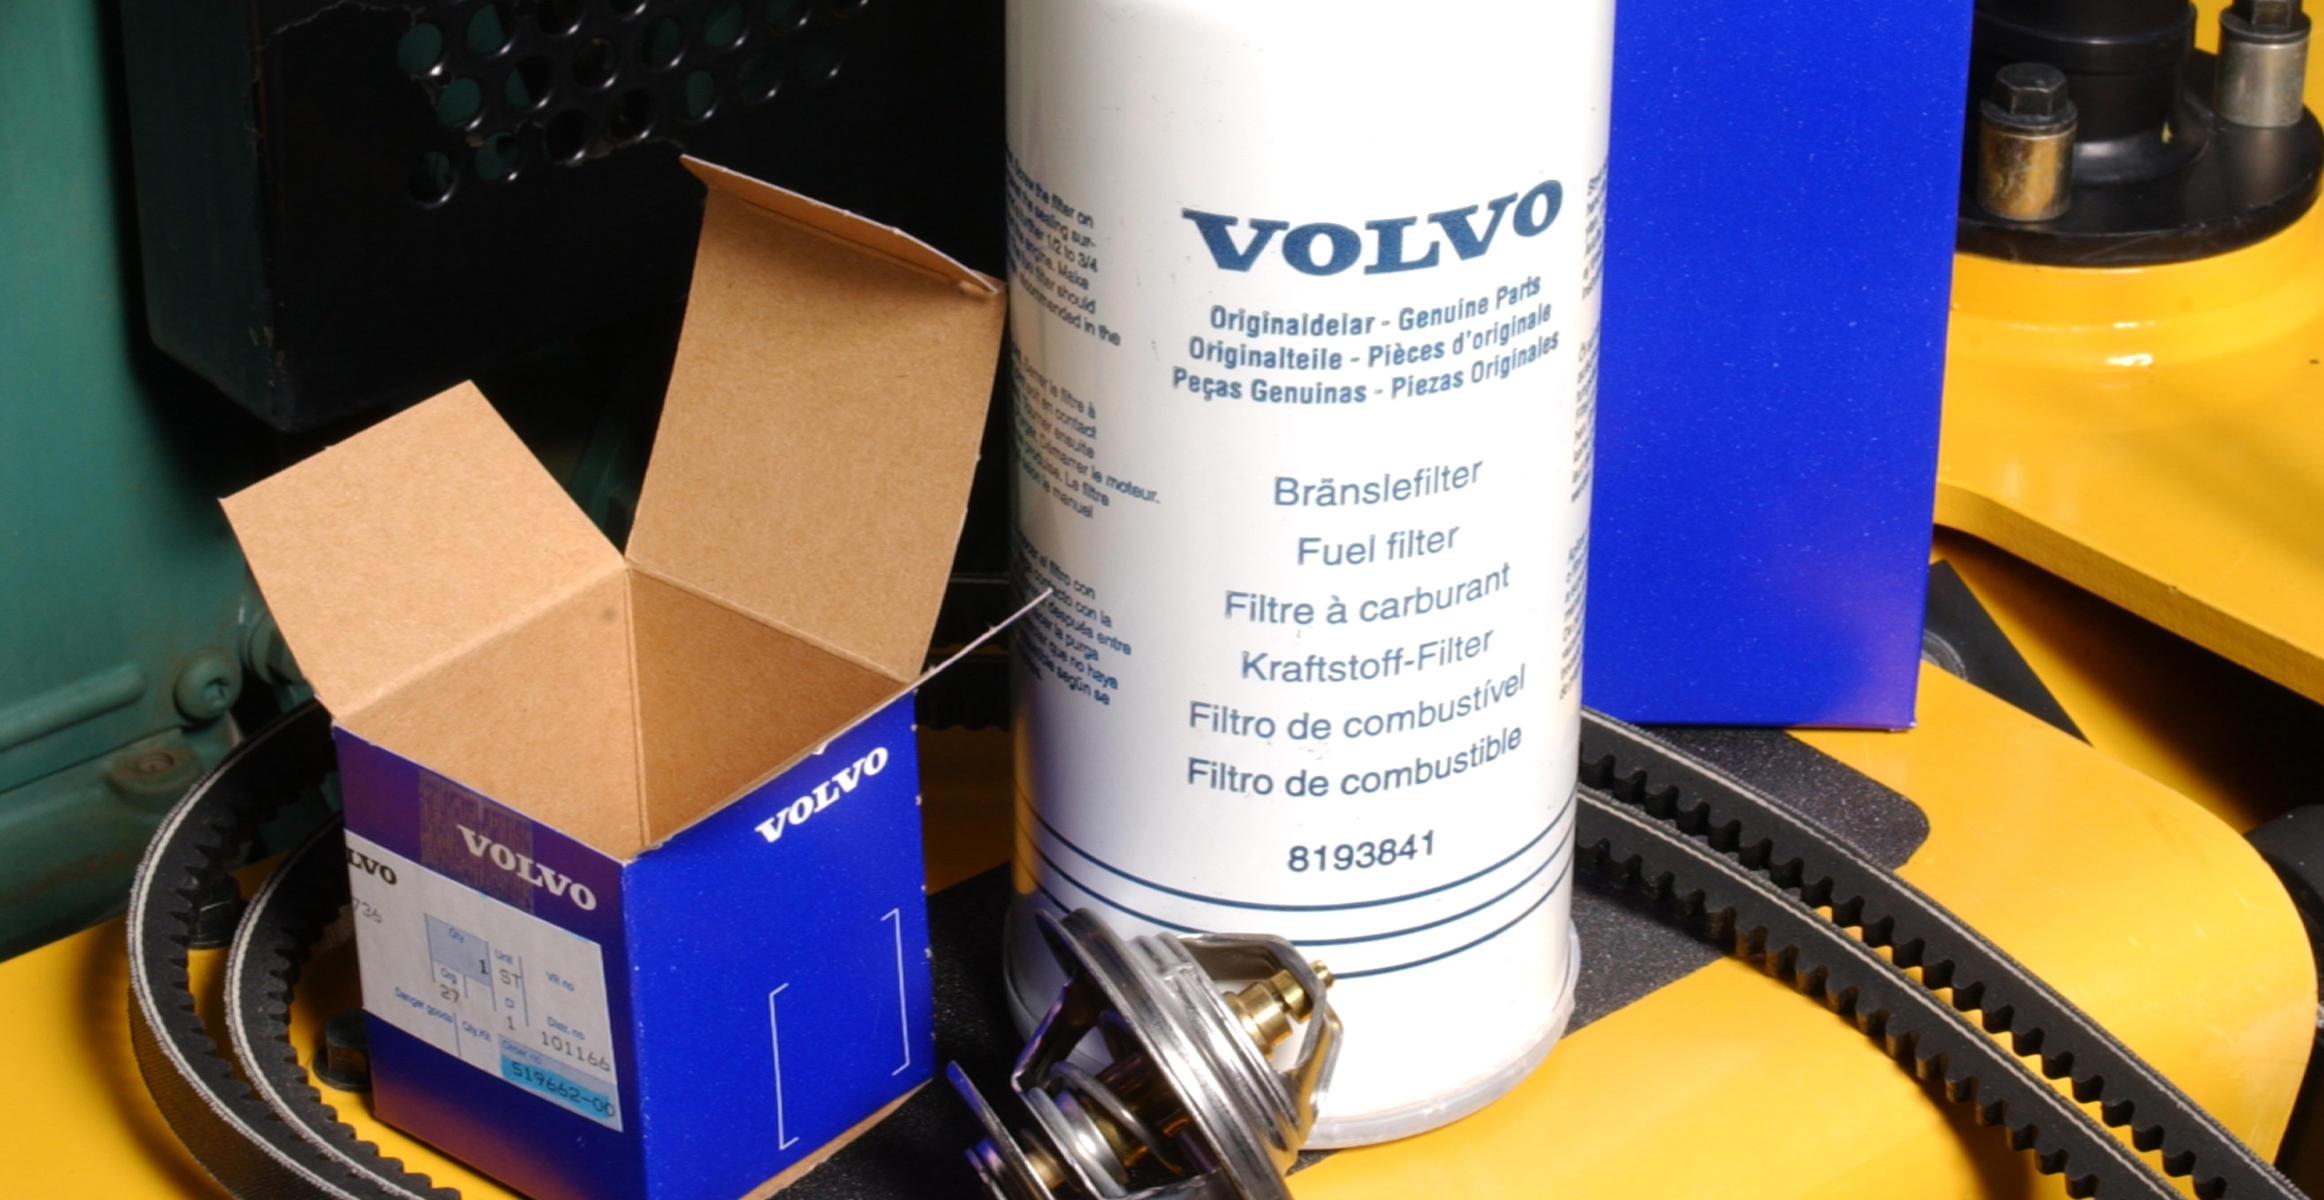 Pre-filling fuel filters